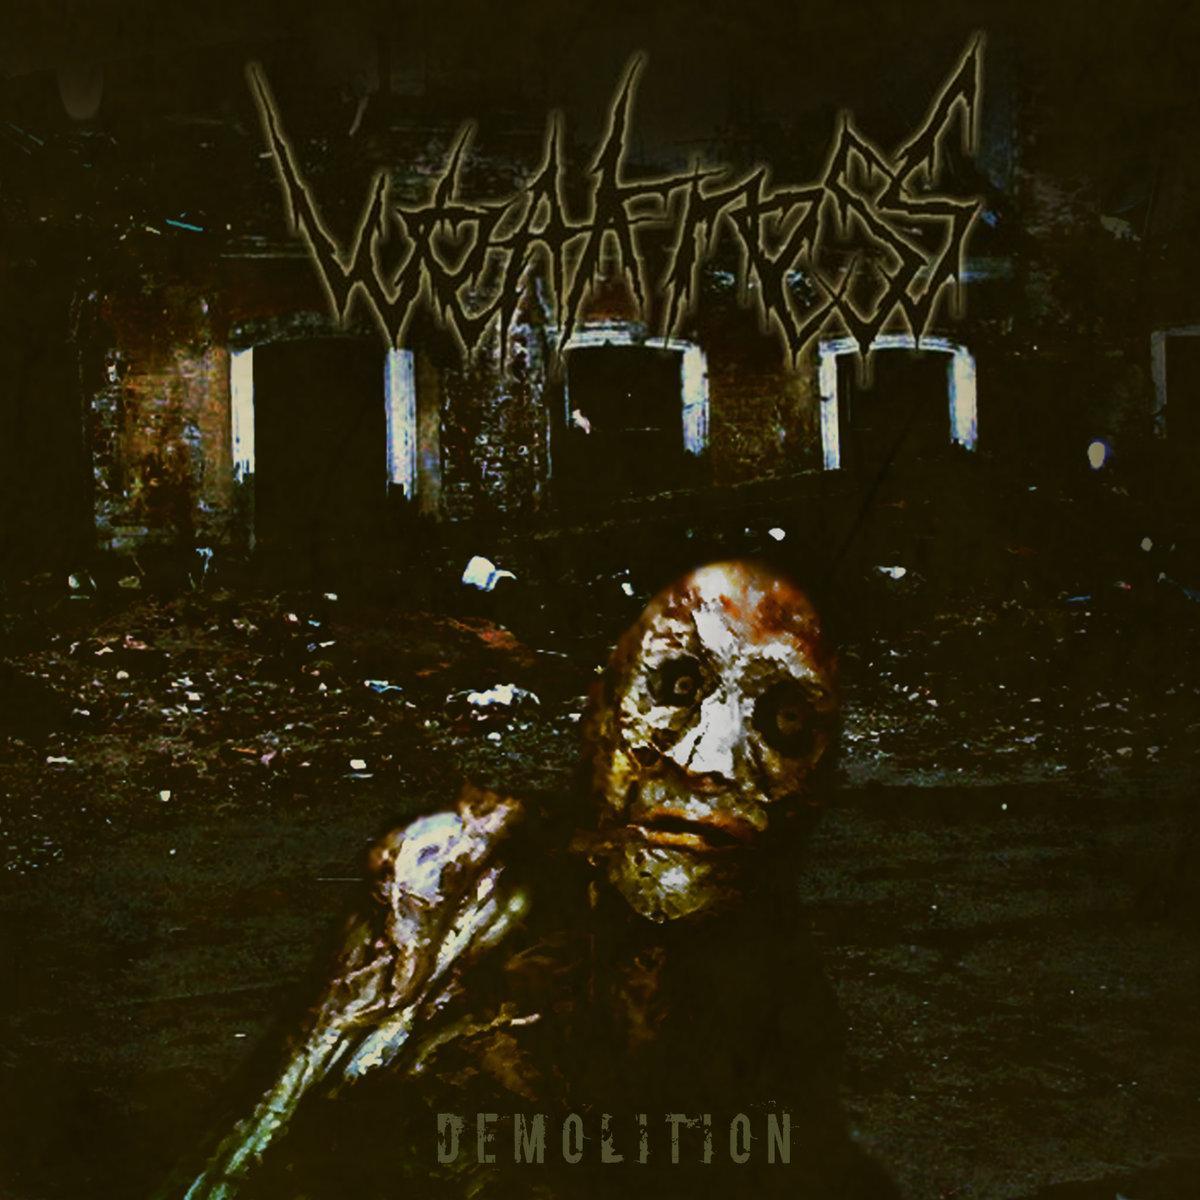 Weakness - Demolition (2016)